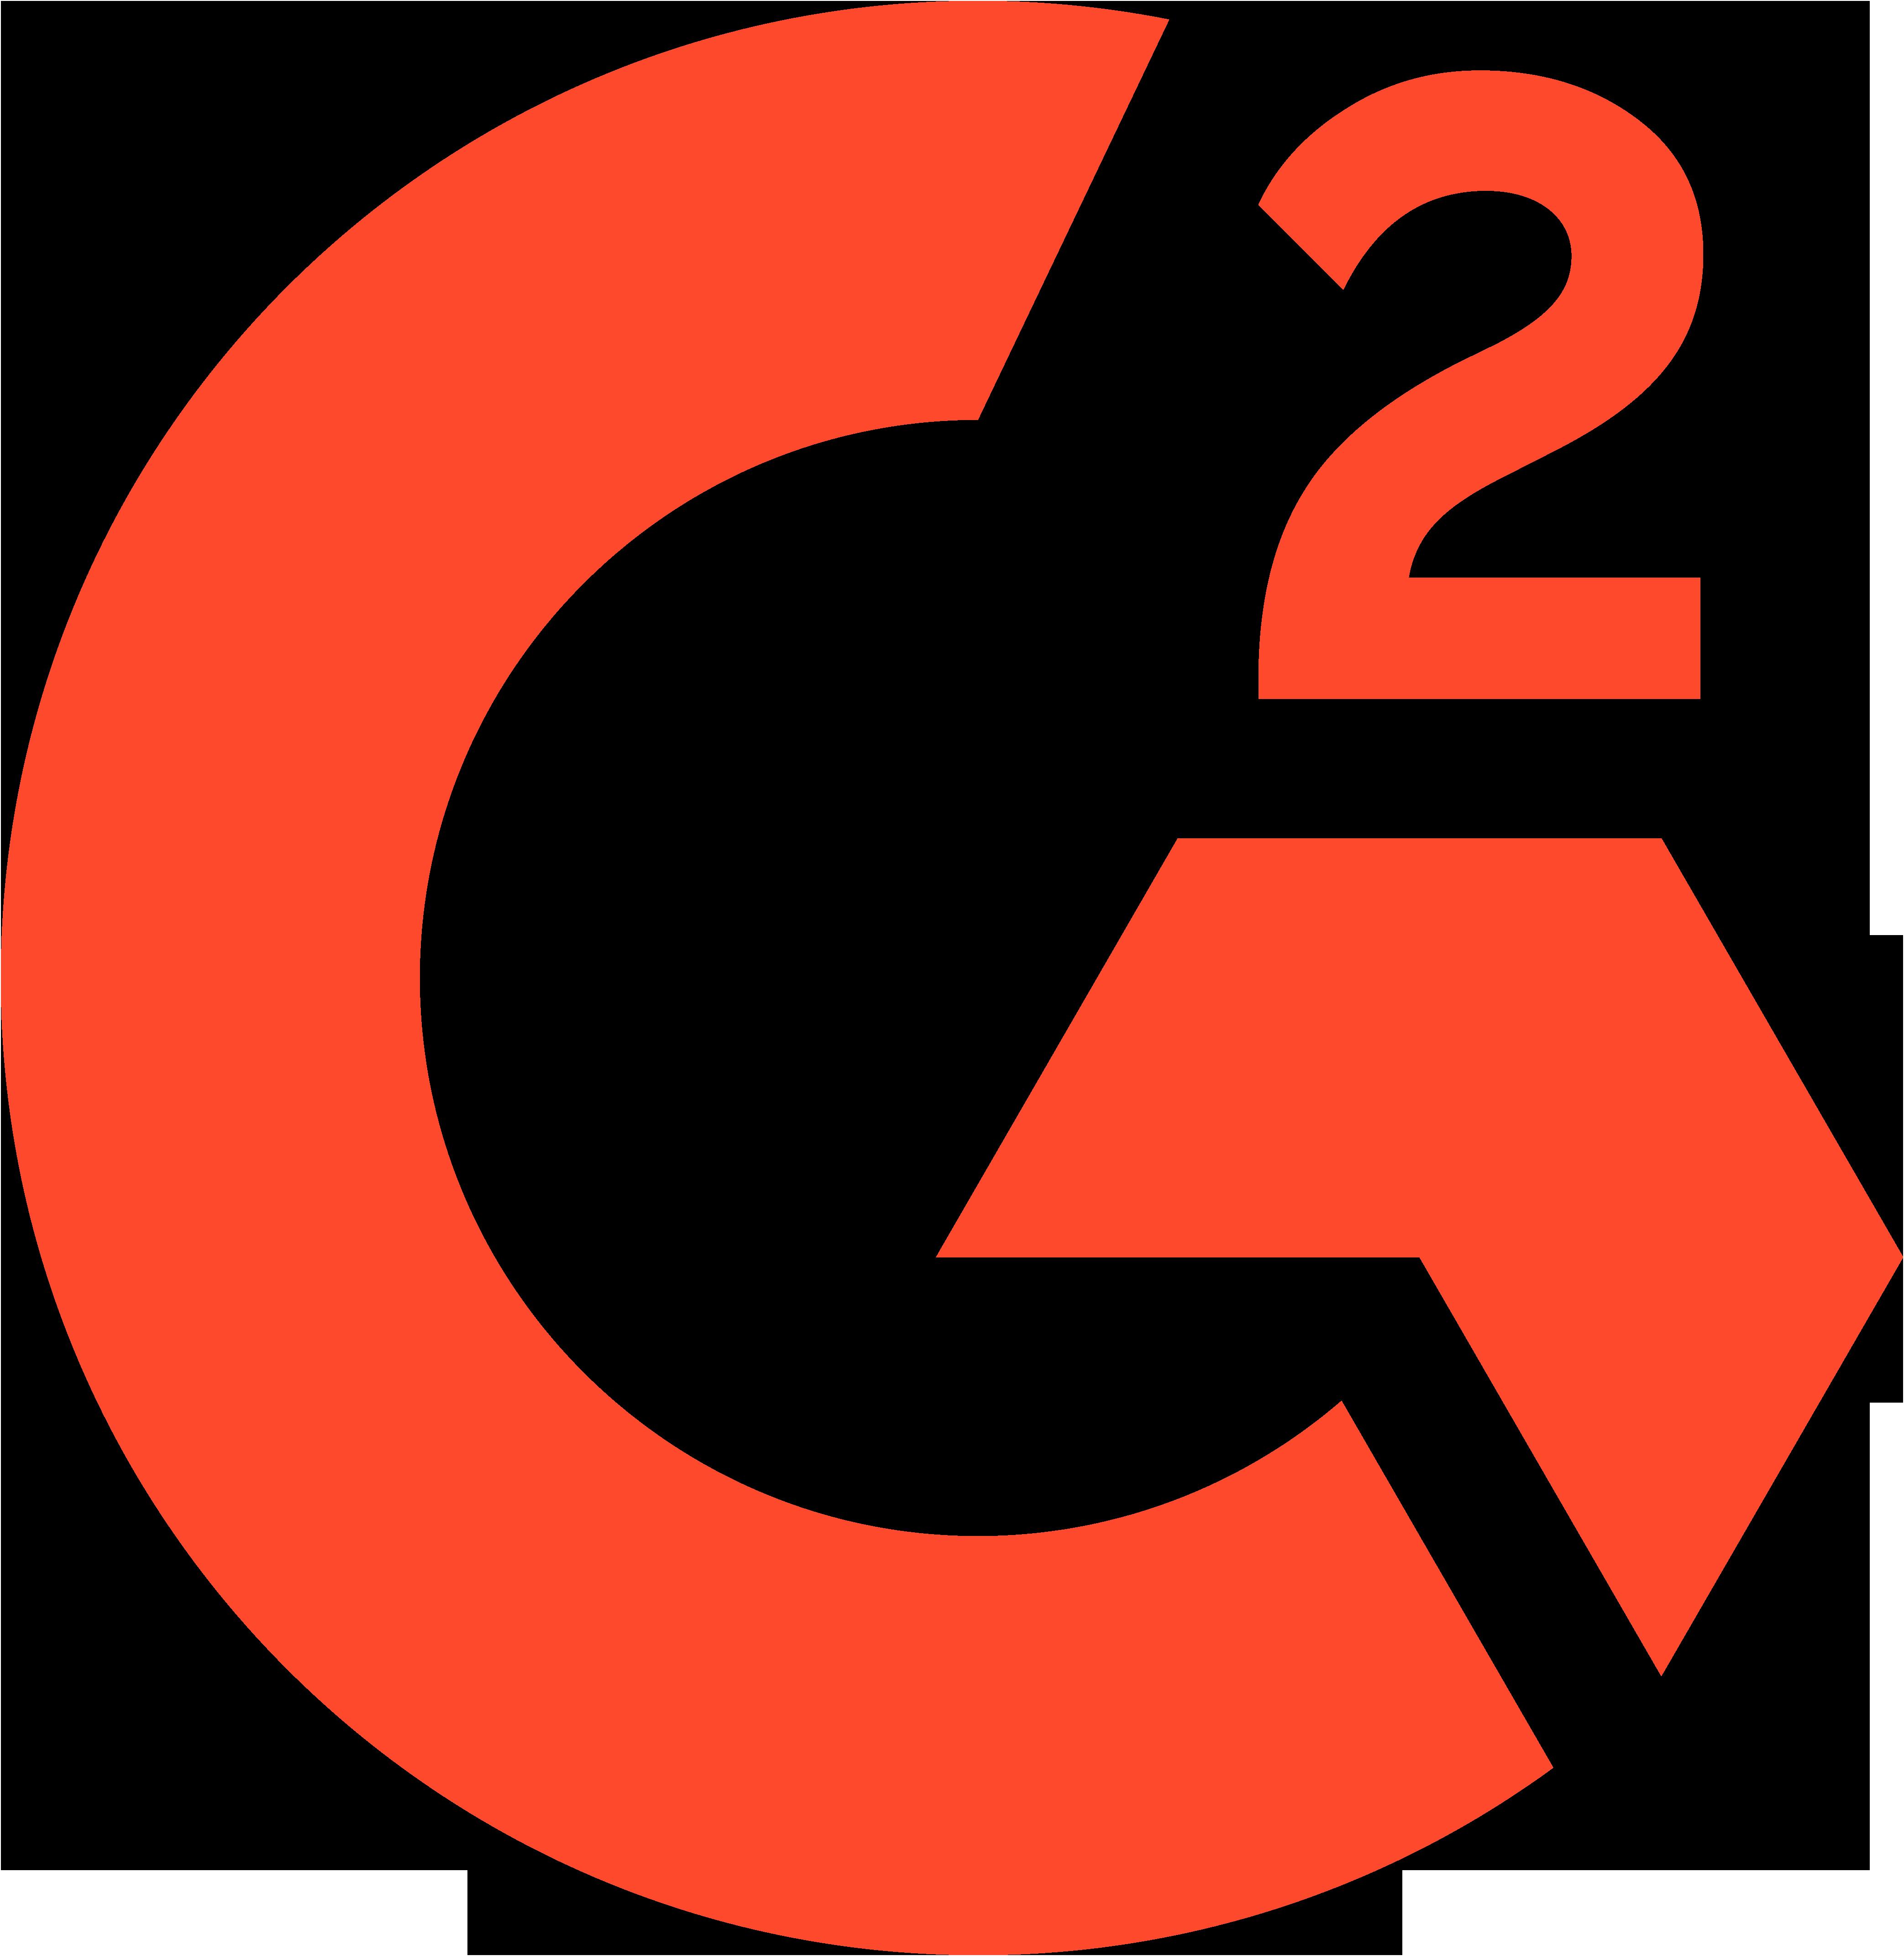 Logo-g2